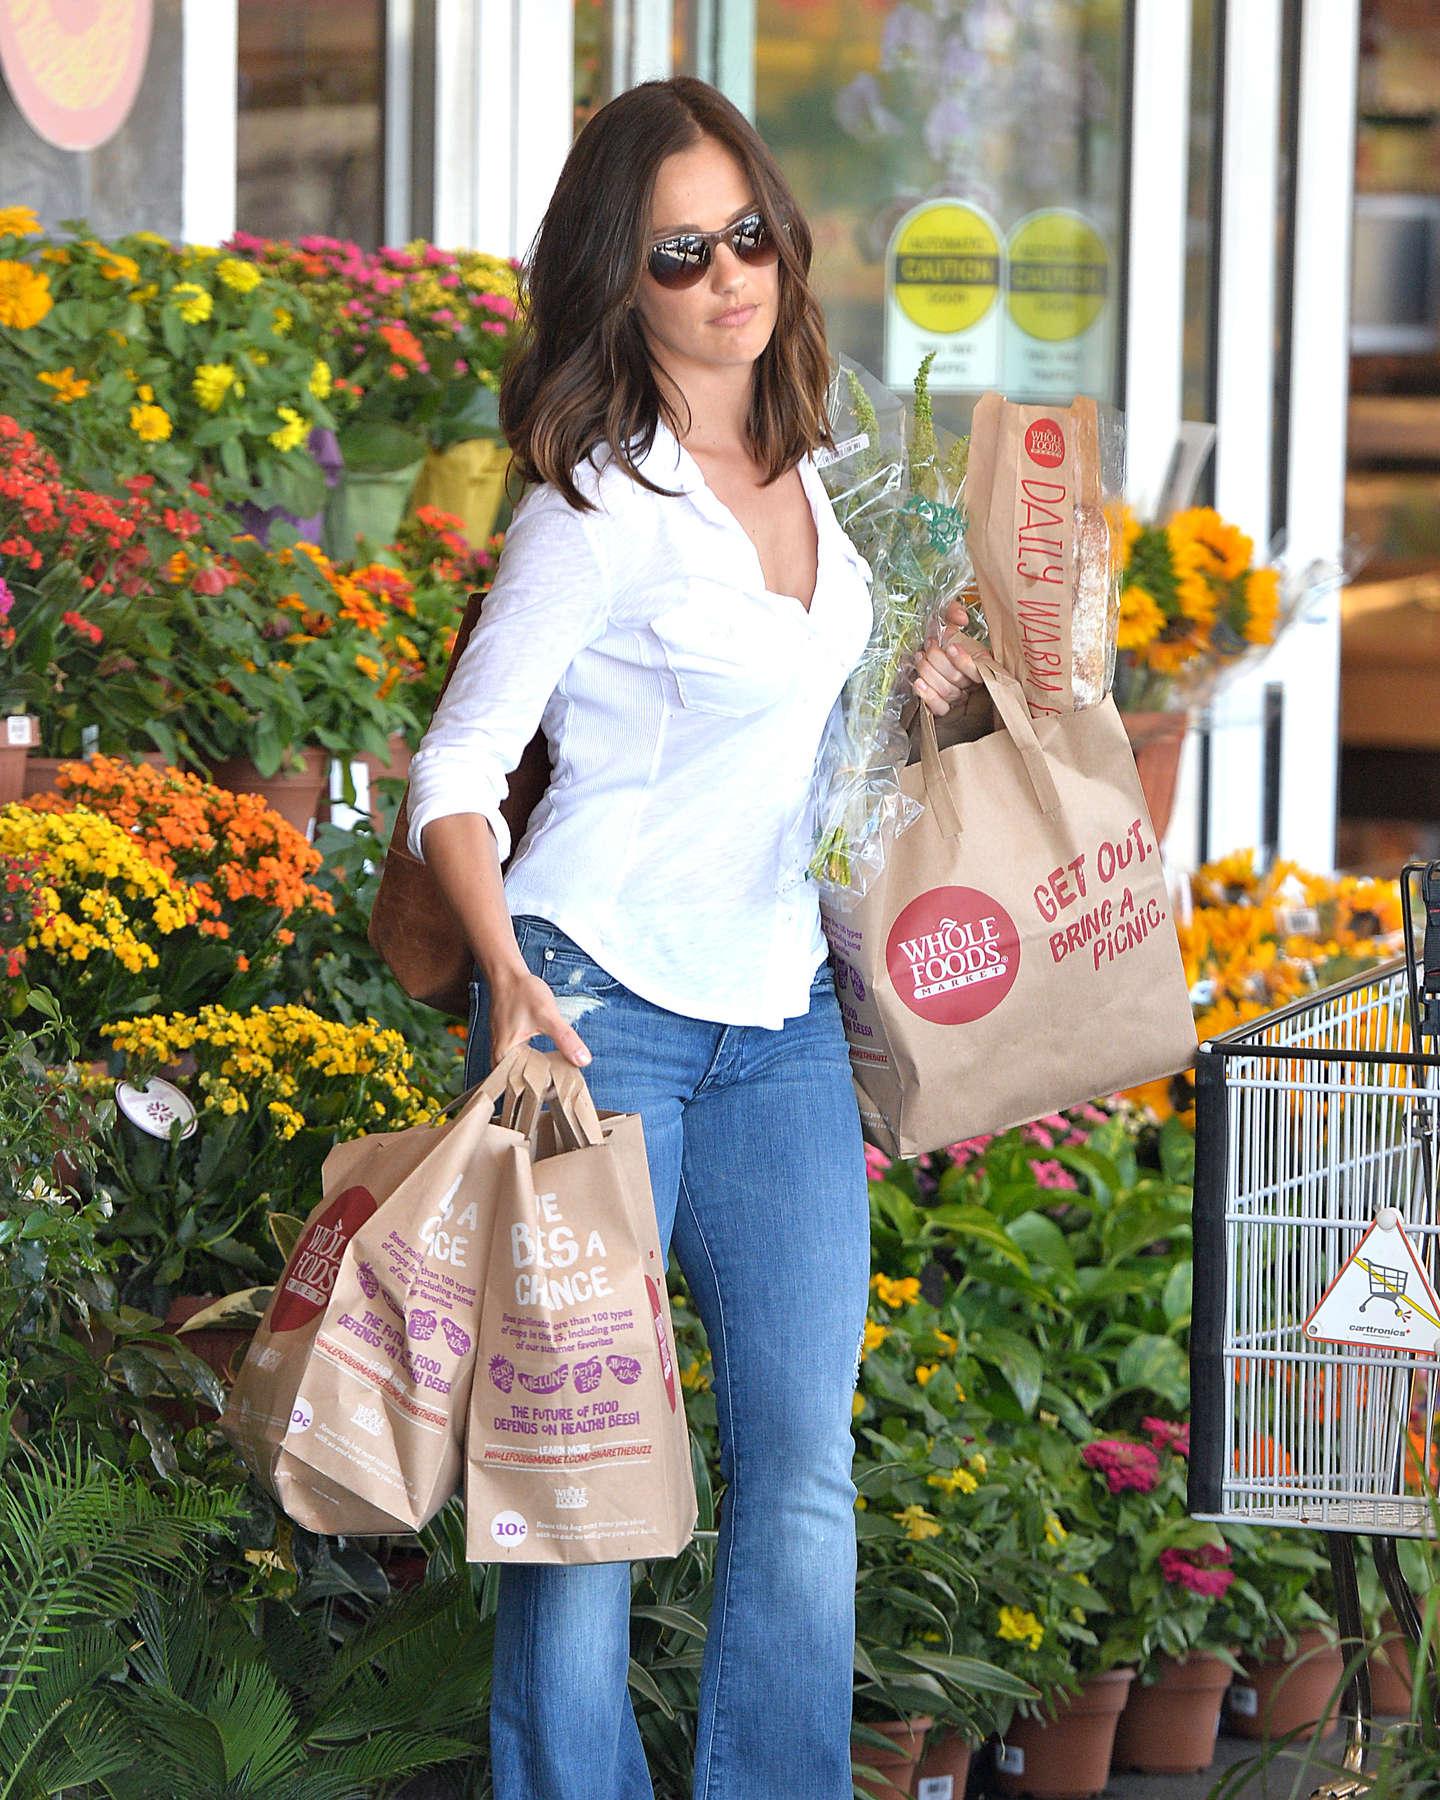 Minka Kelly shopping candids at Whole Foods